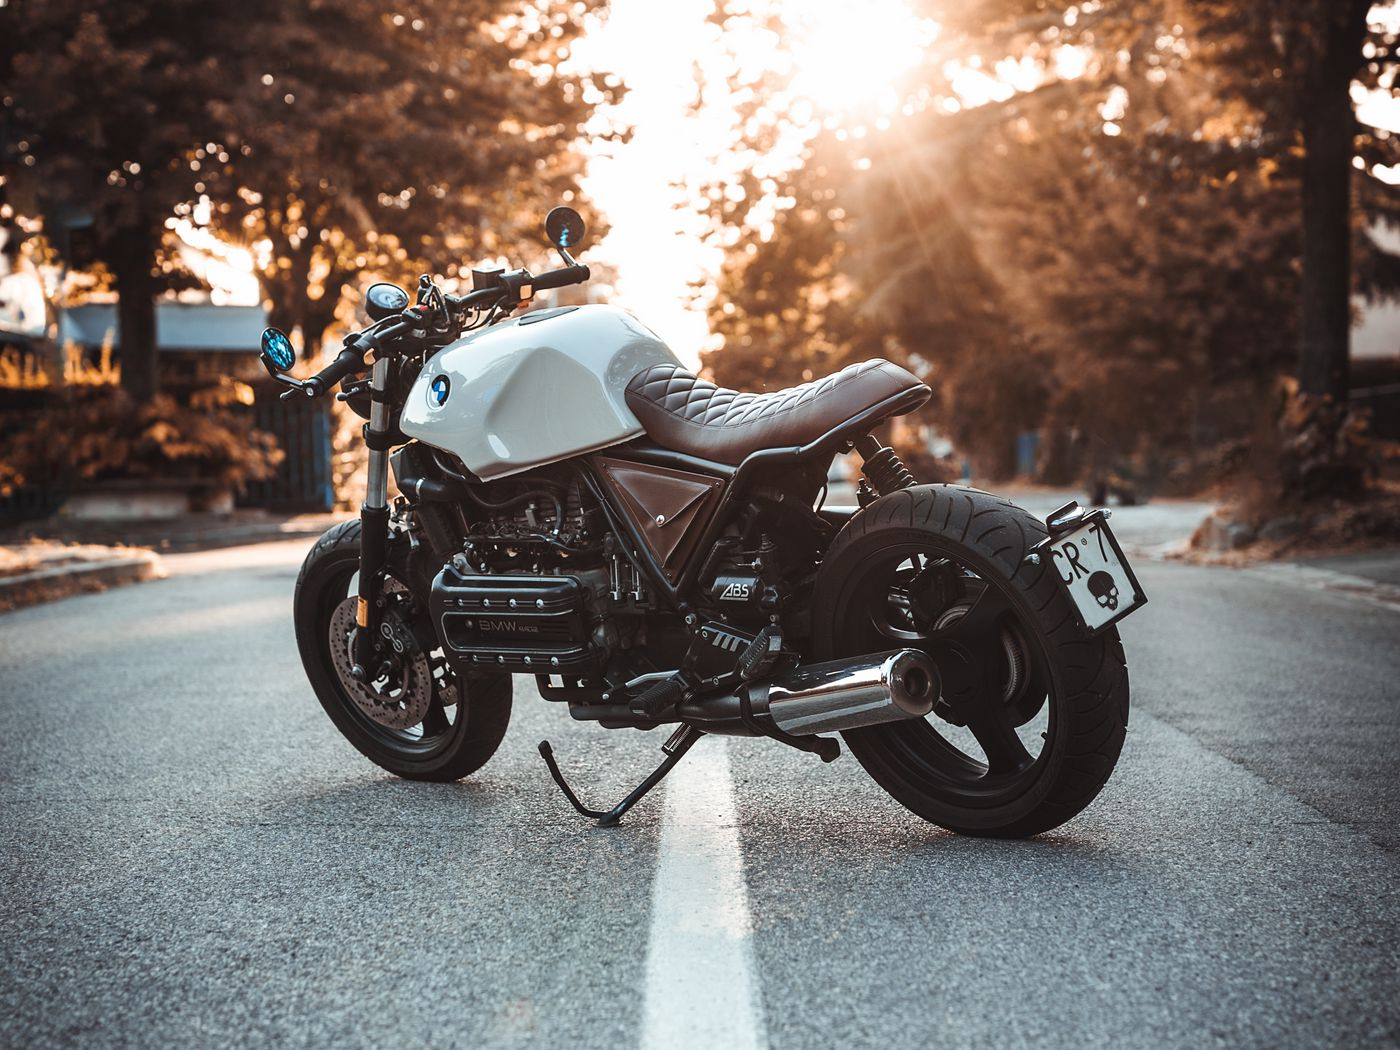 1400x1050 Обои bmw k100, мотоцикл, байк, вид сбоку